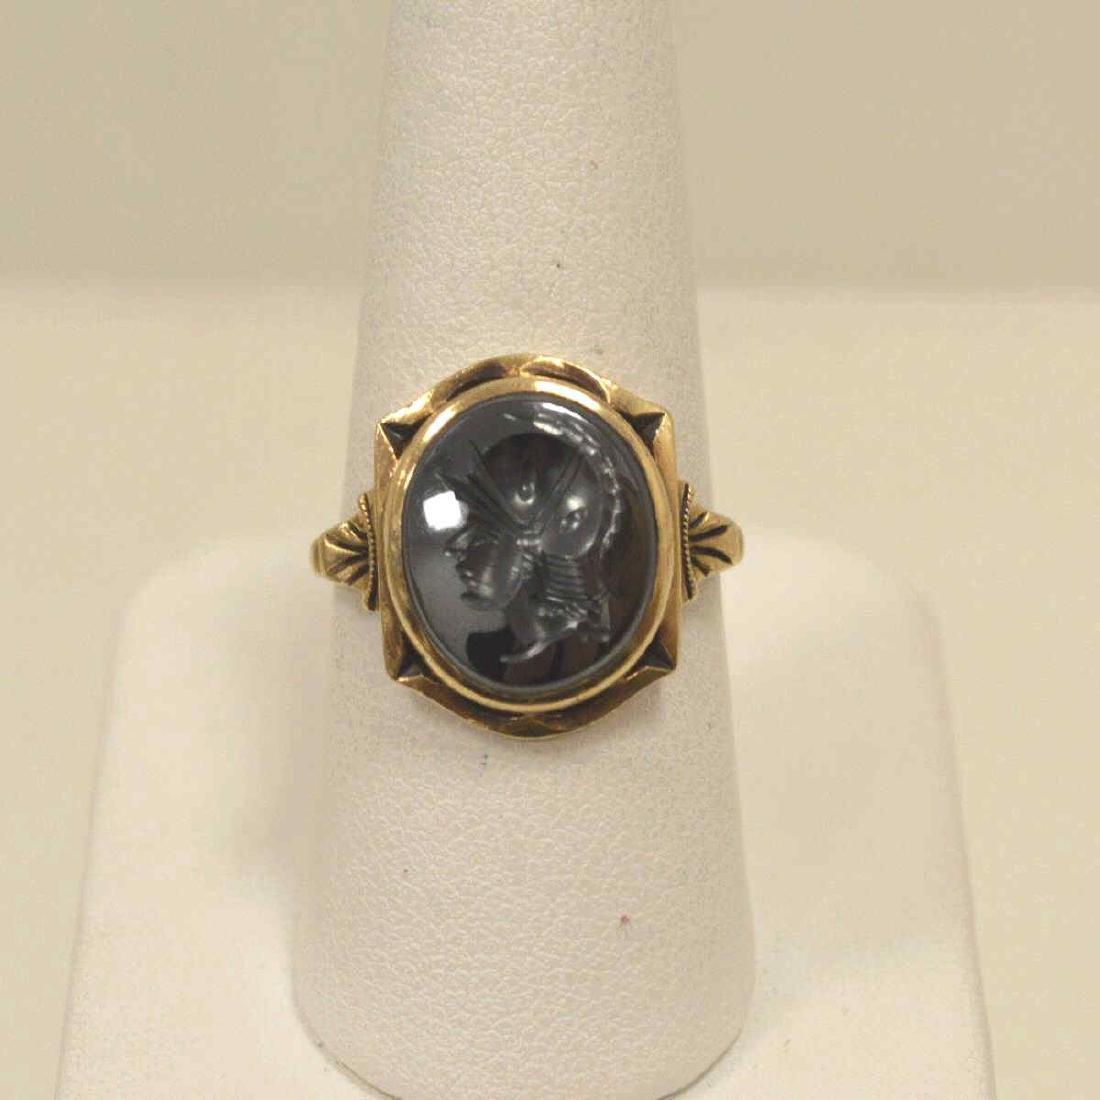 10kt yellow gold hematite intaglio ring